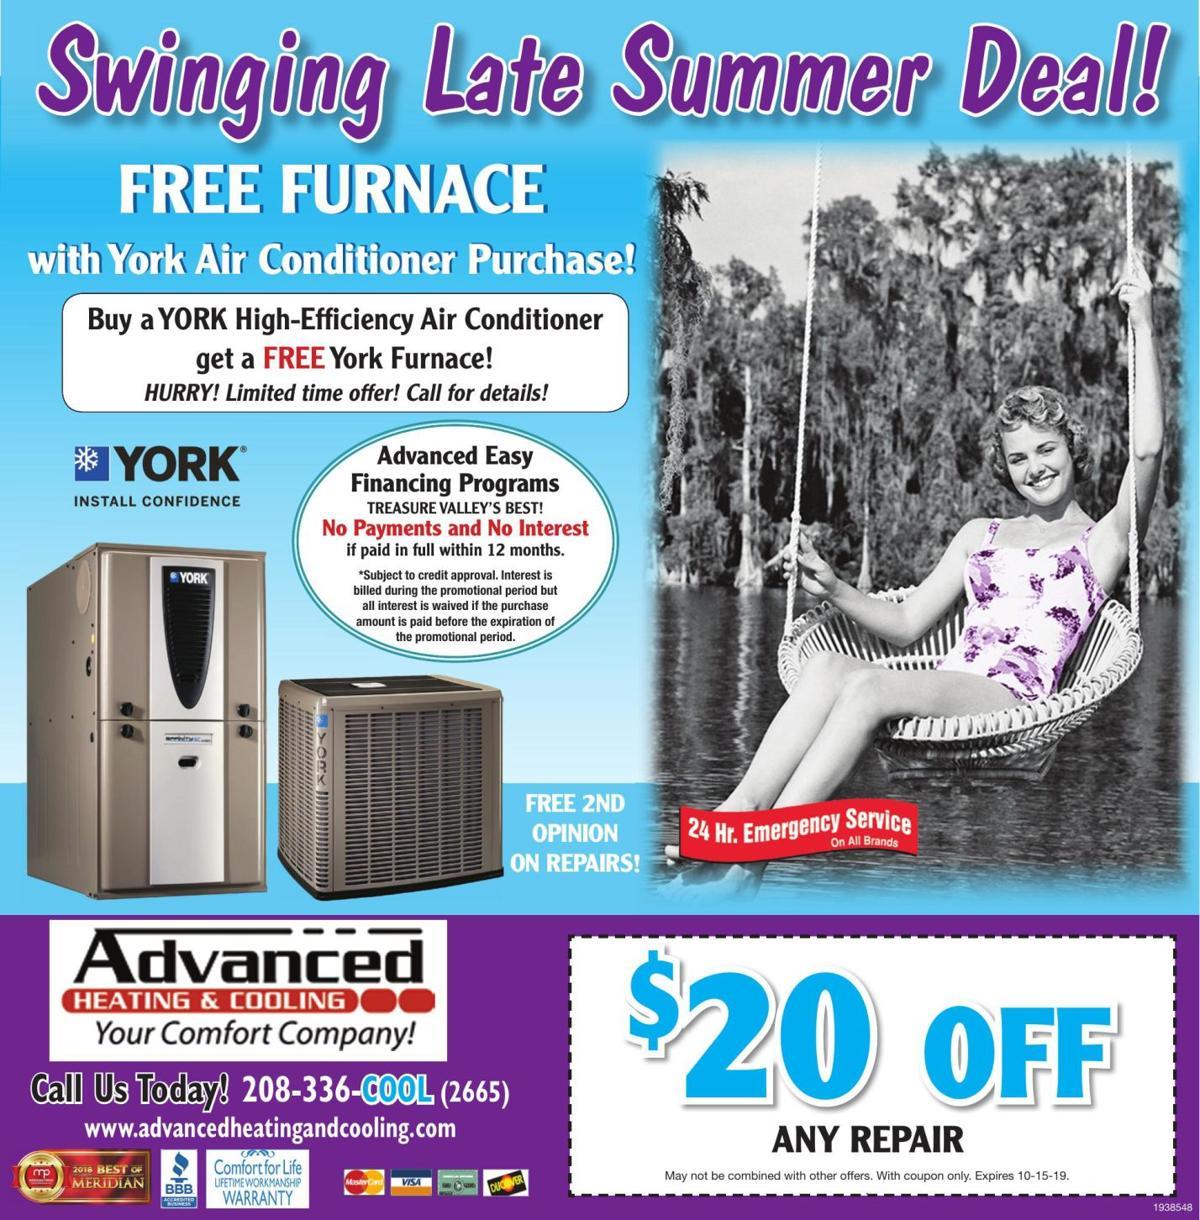 Advanced Heating & Cooling